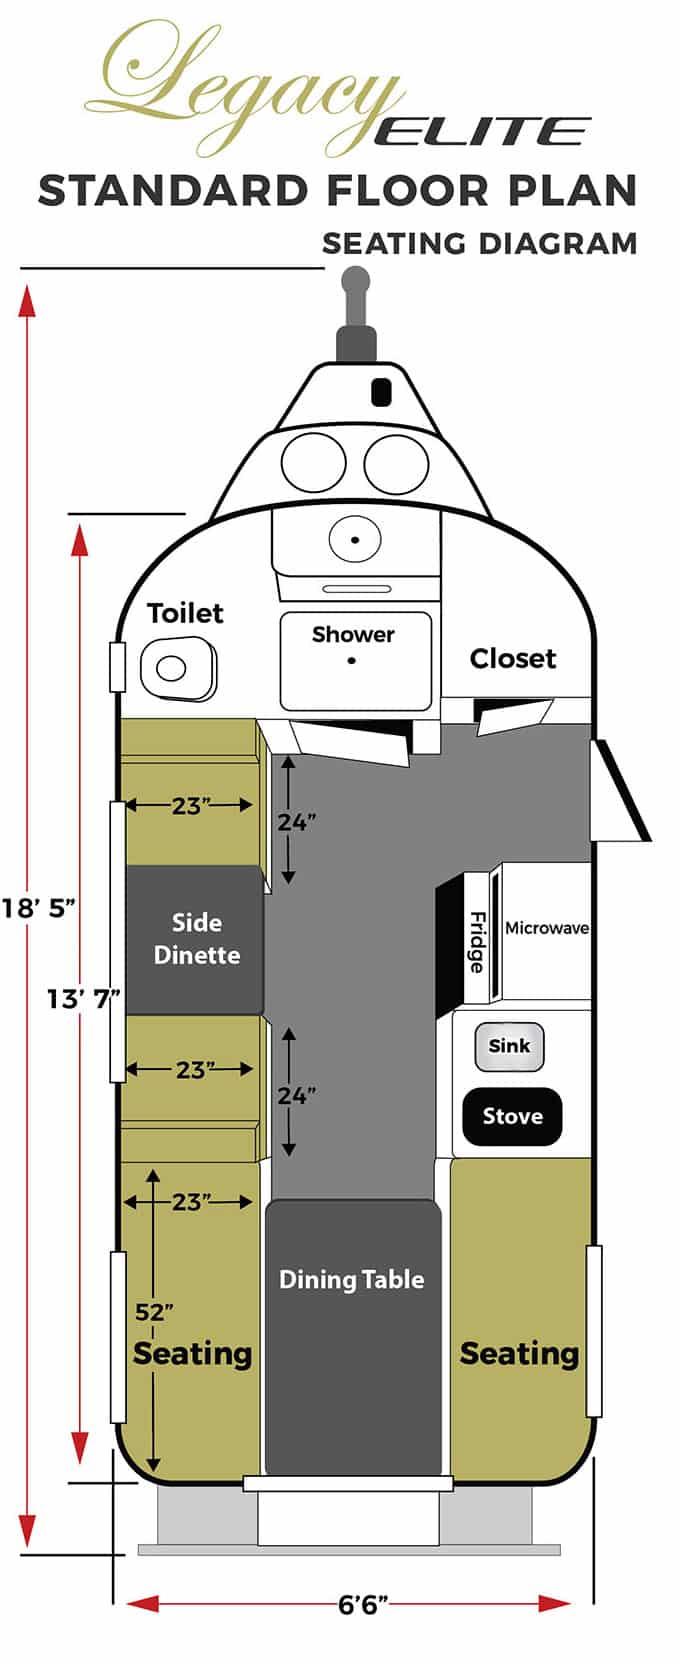 oliver travel trailers legacy elite 1 standard seating floor plan vertical